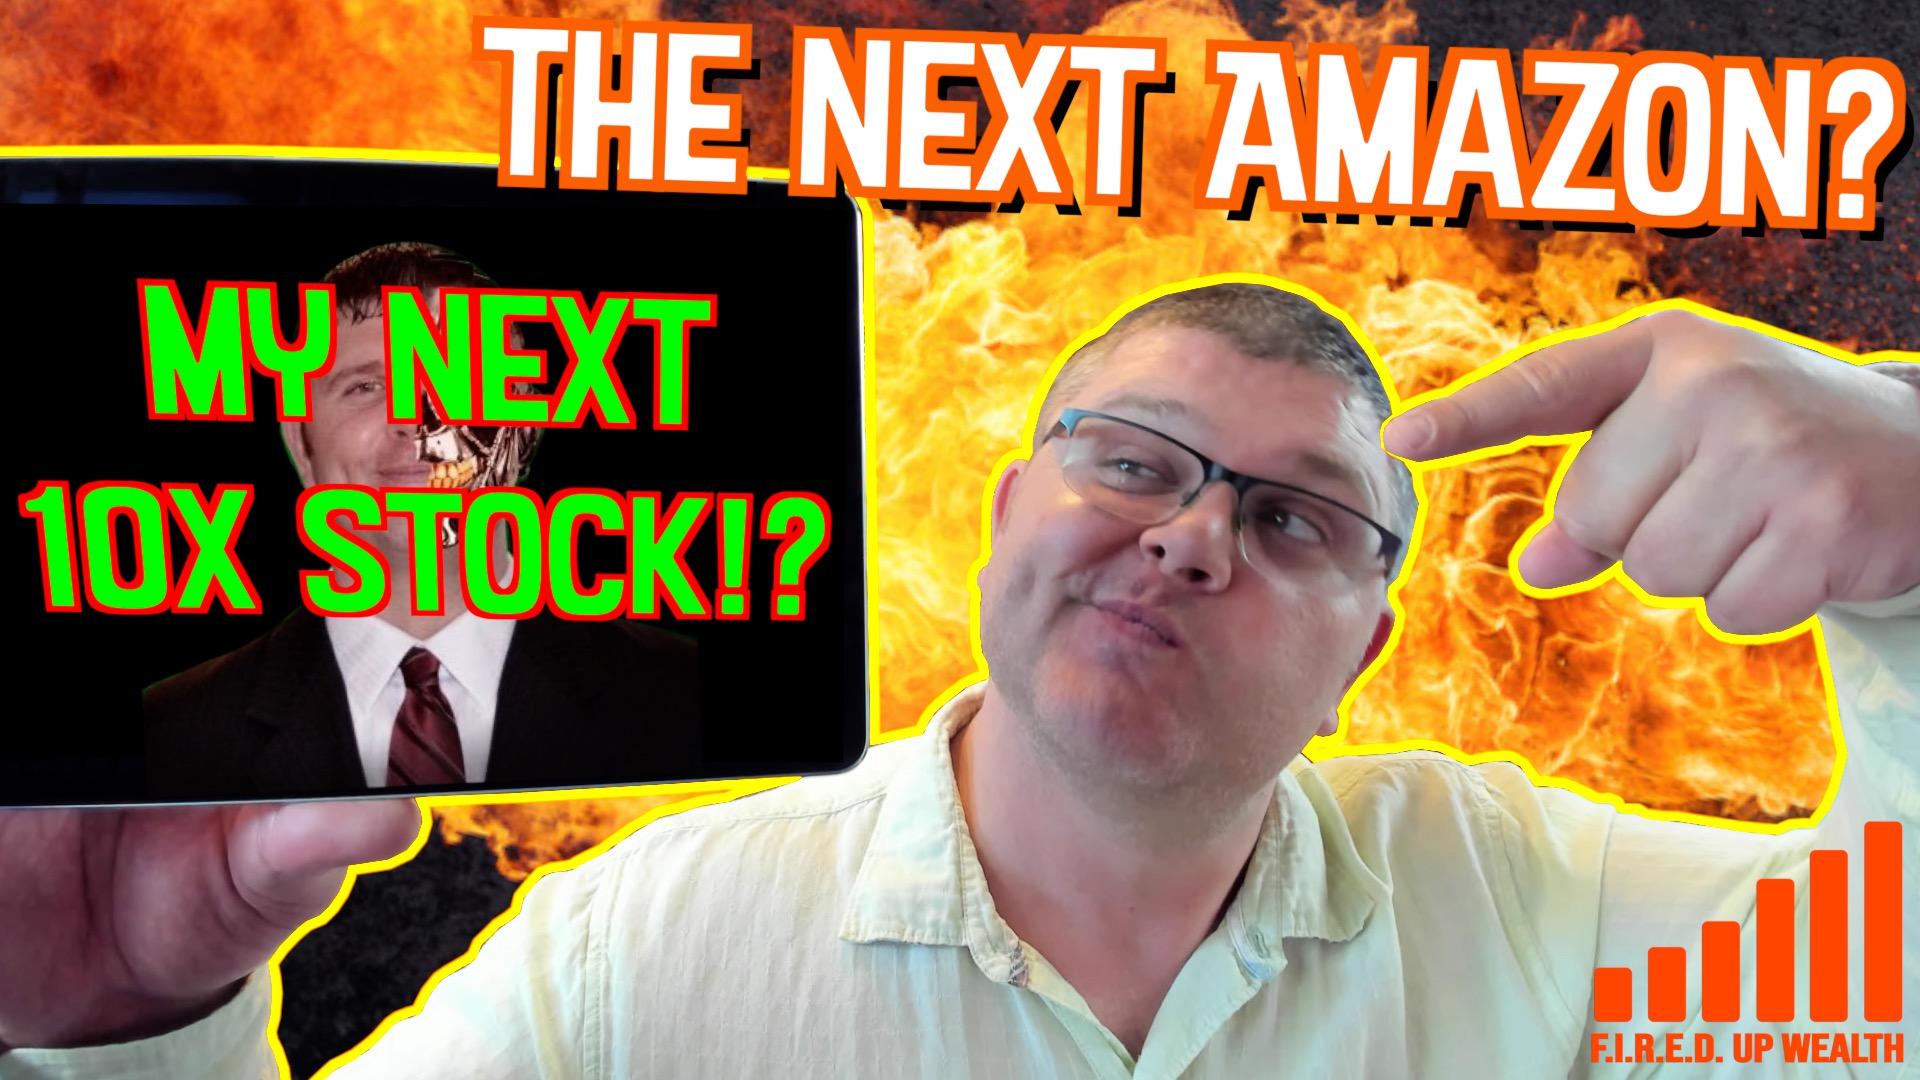 10X Stock: The Next Amazon?